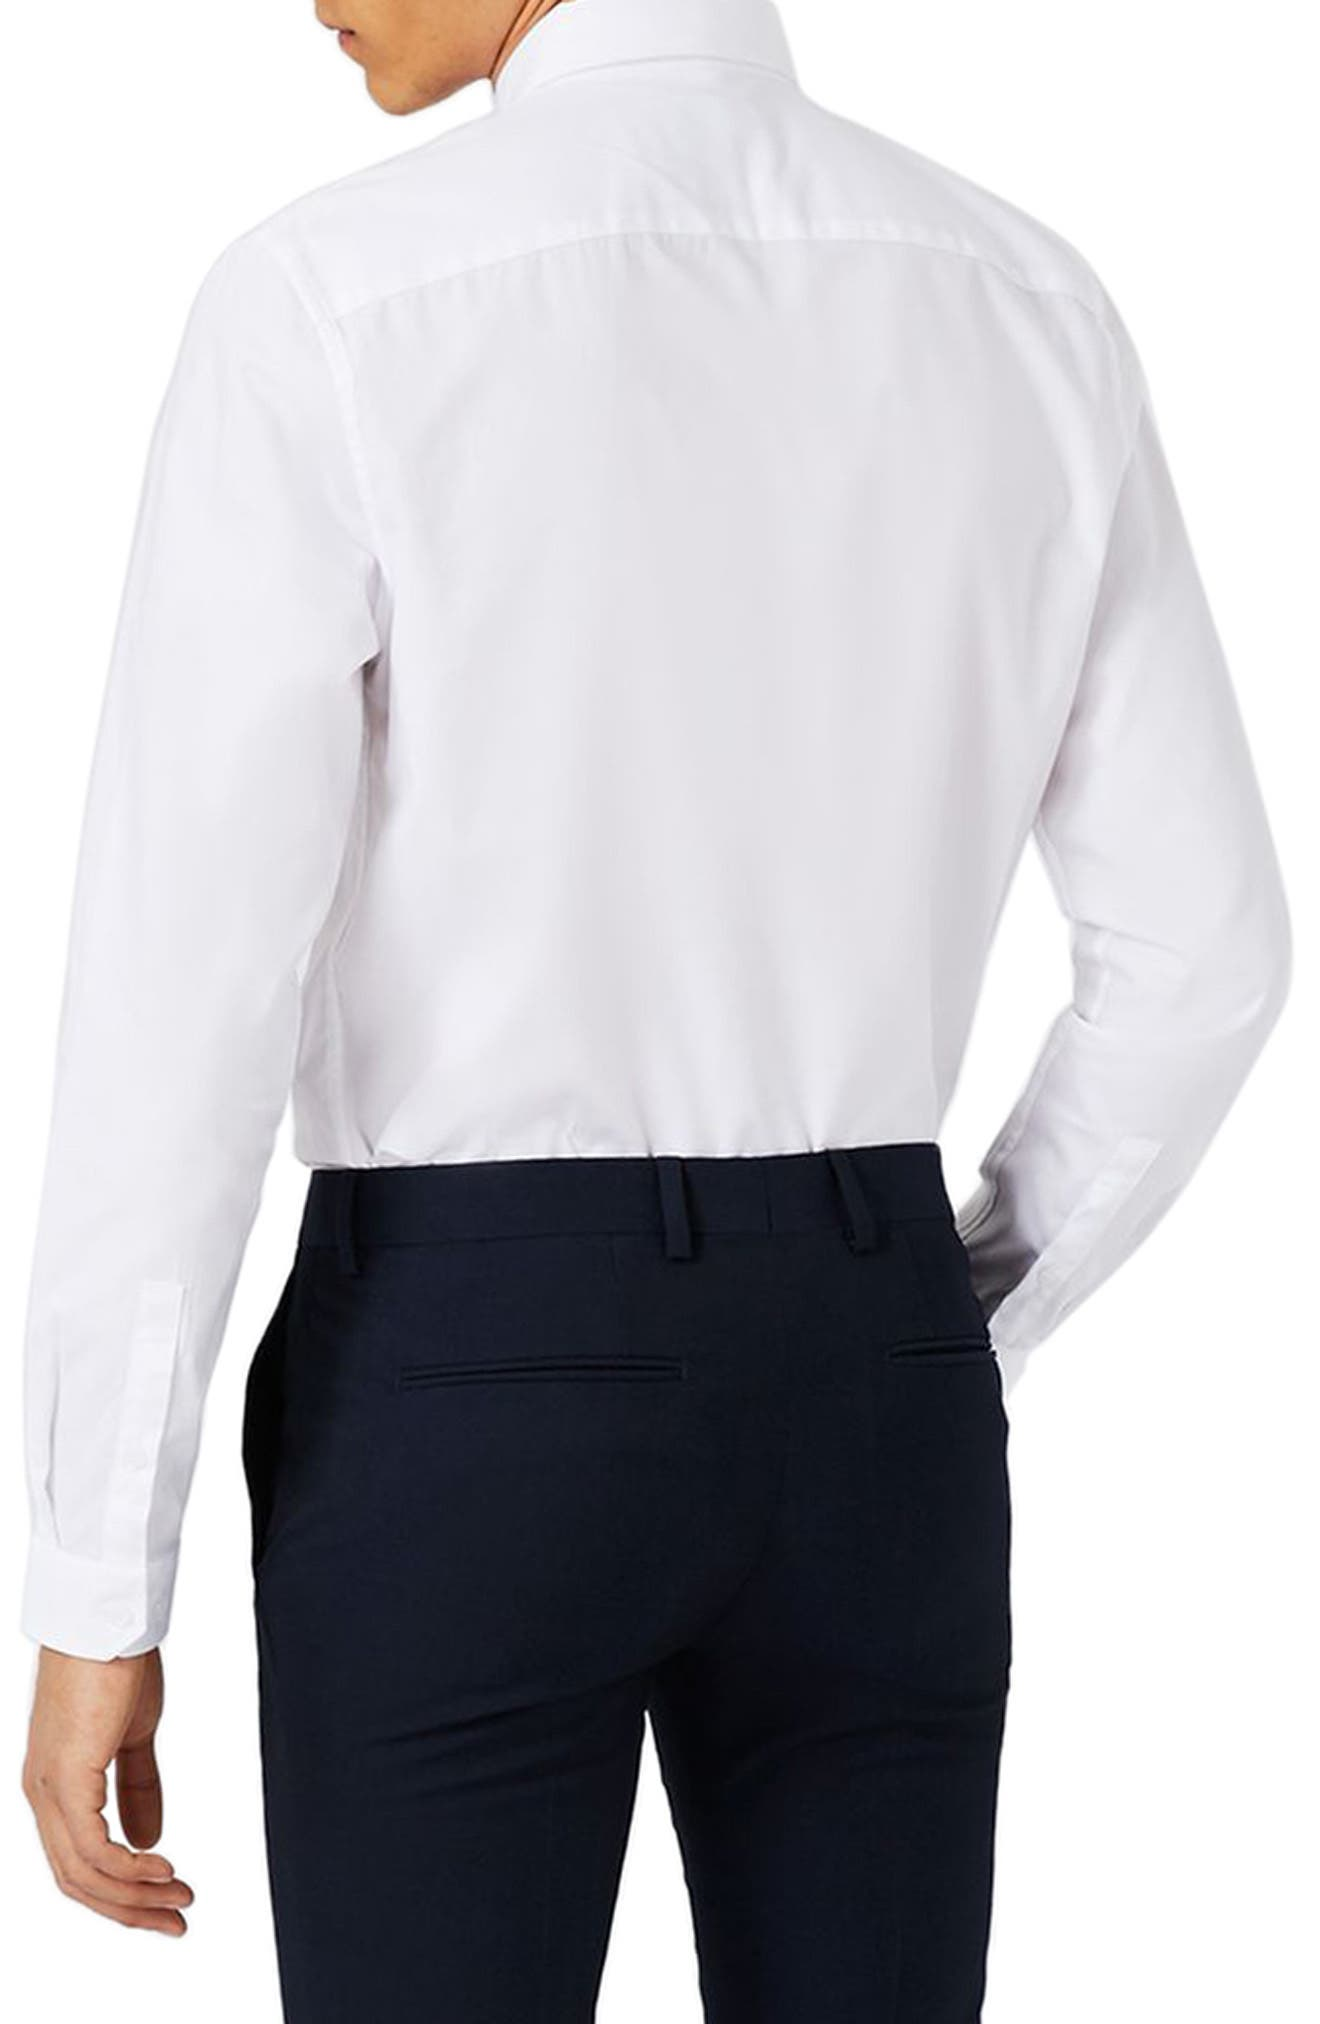 Trim Fit Chisel Collar Dress Shirt,                             Alternate thumbnail 3, color,                             White